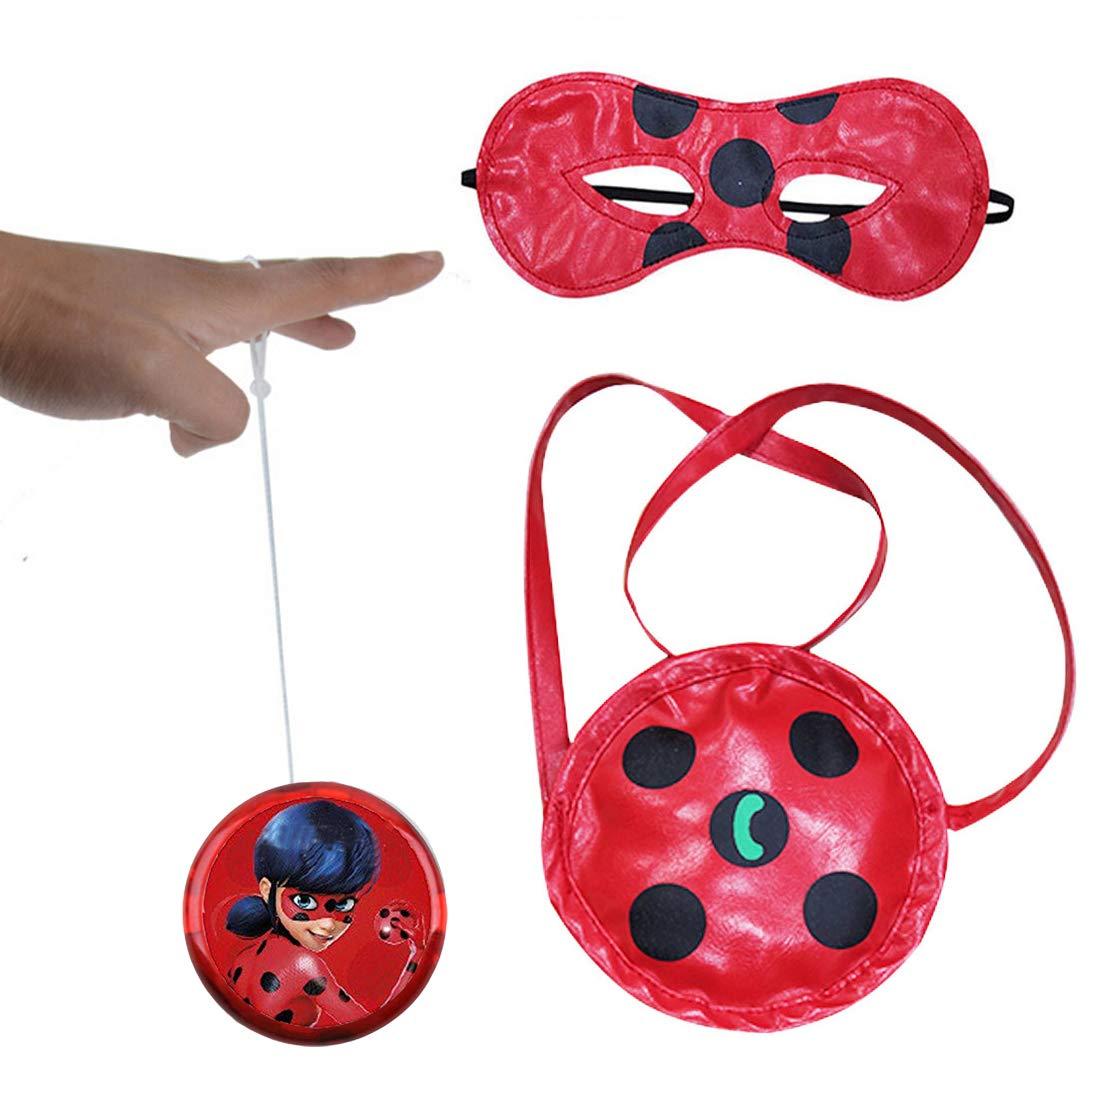 Geenber Miraculous Ladybug Yo-Yos Ball Toy Set para niños con ...